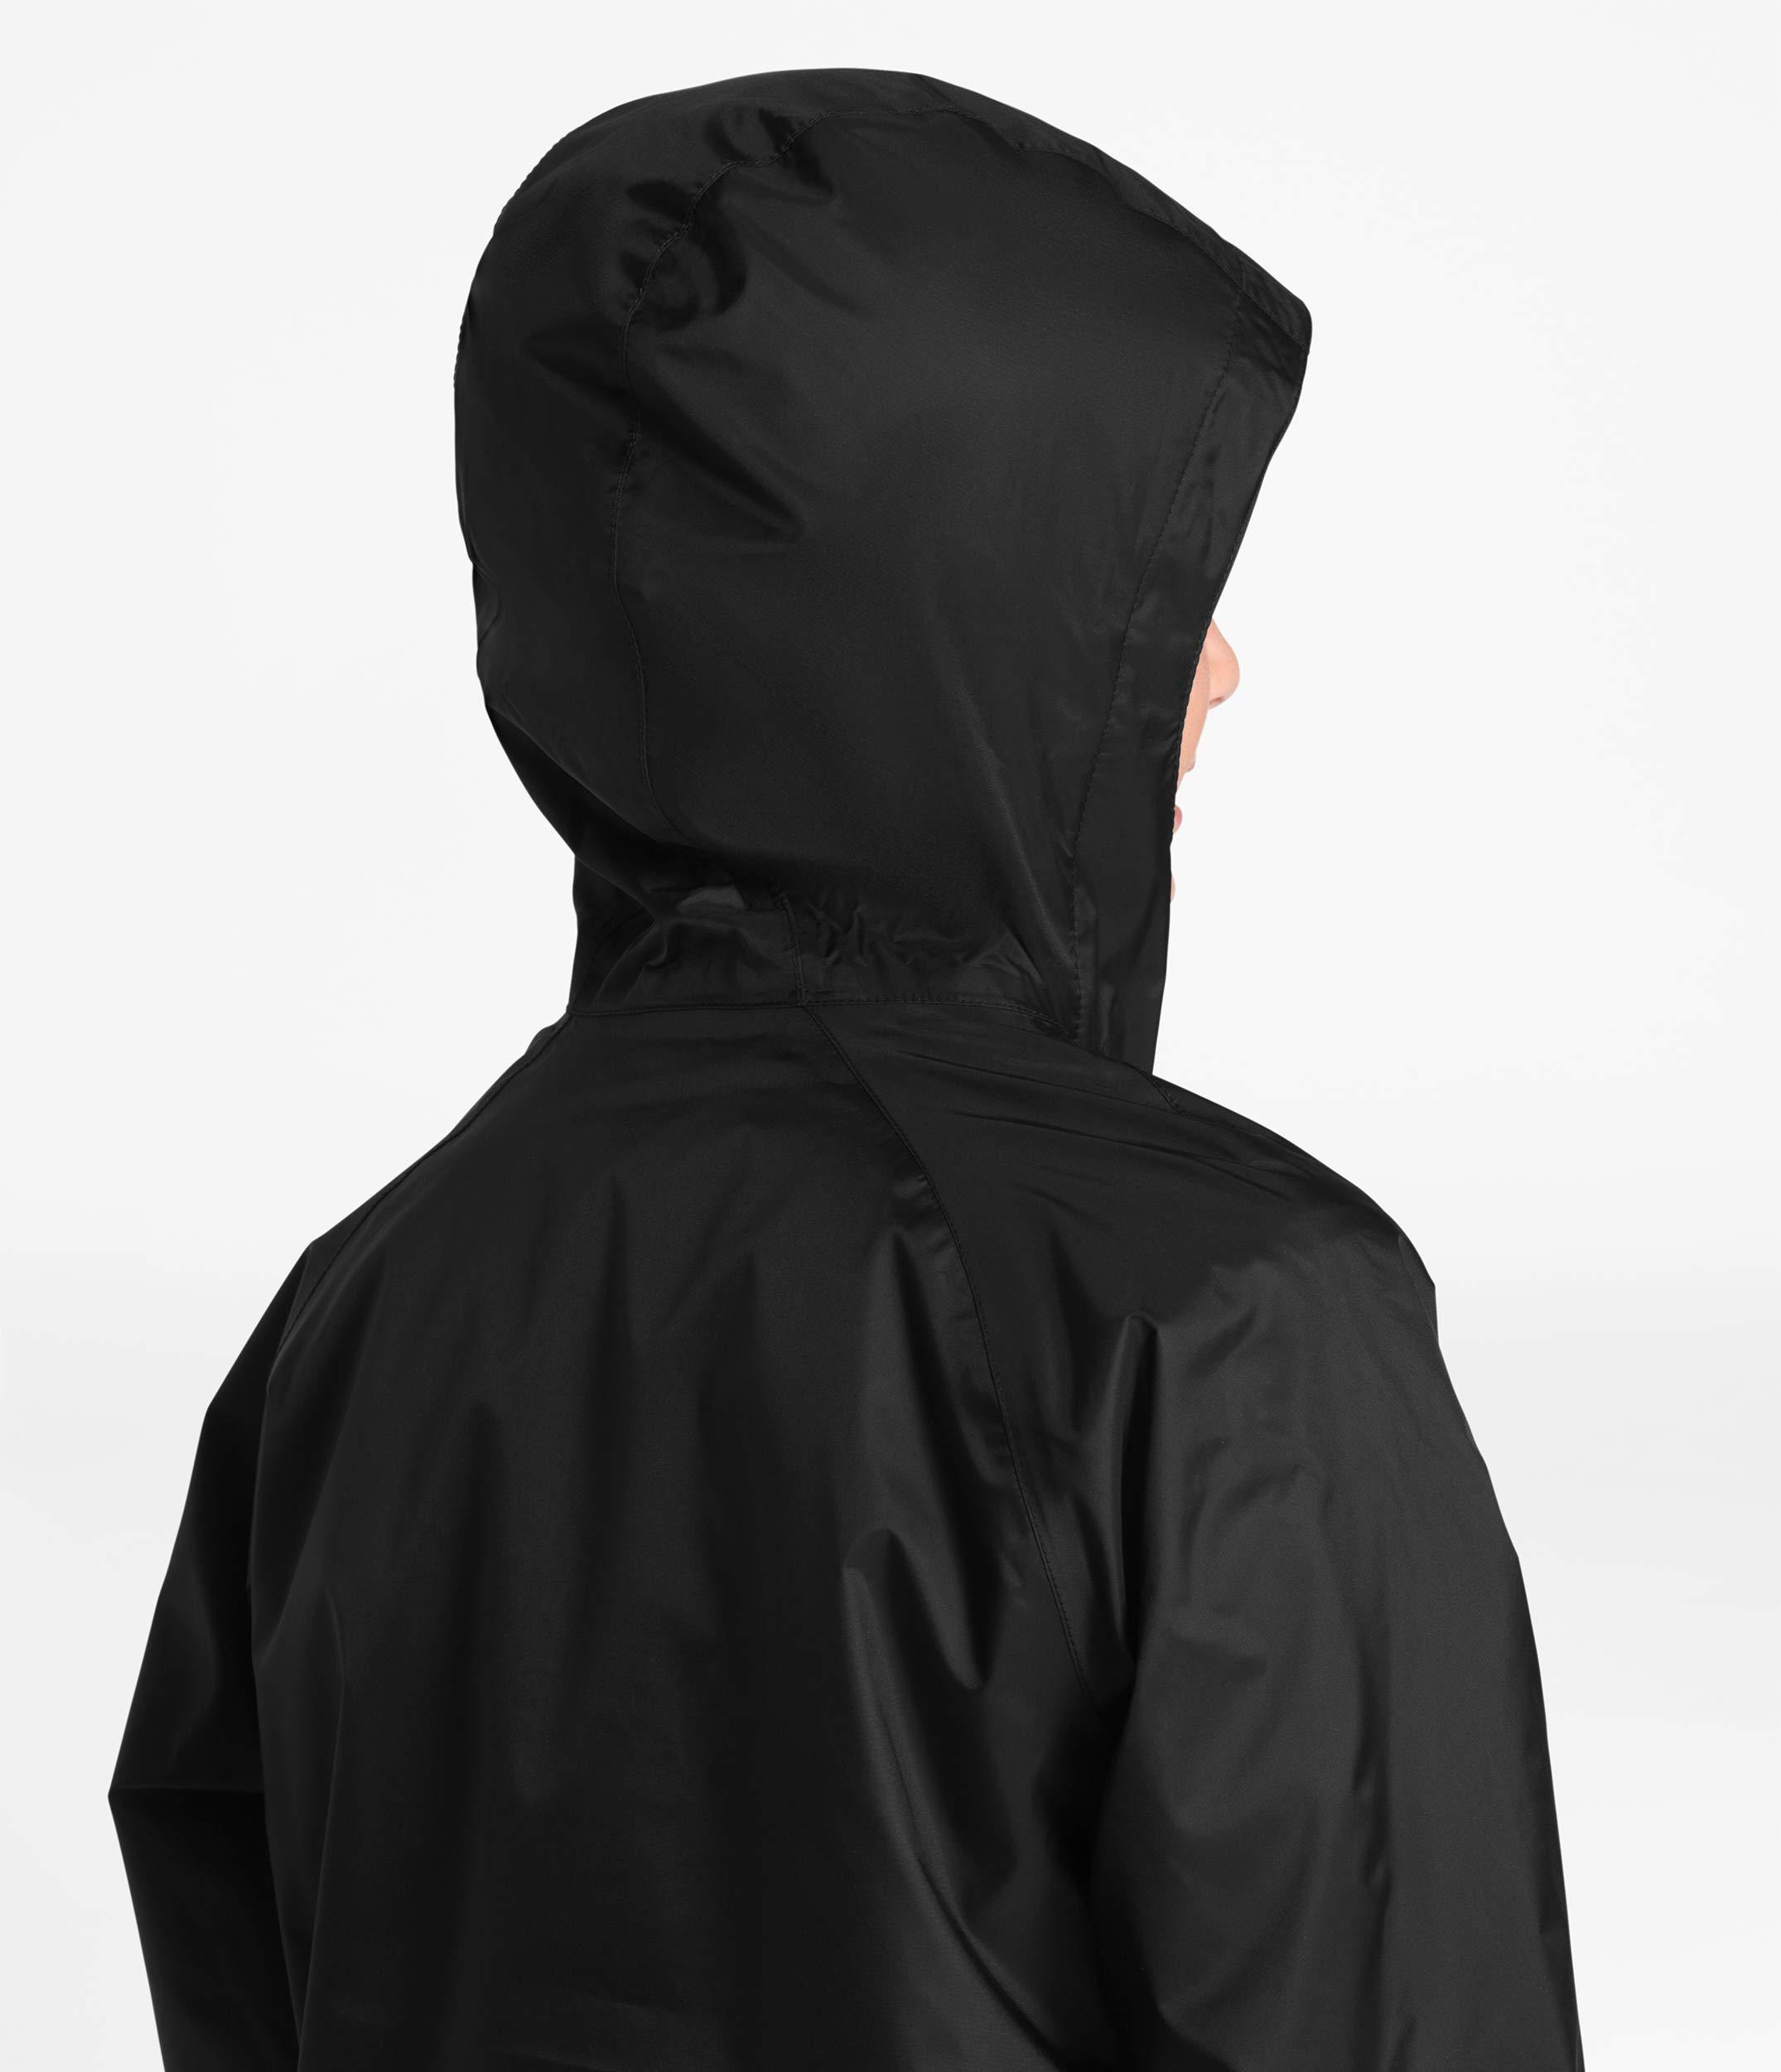 The North Face Kids Boy's Zipline Rain Jacket (Little Kids/Big Kids) TNF Black Large by The North Face (Image #4)